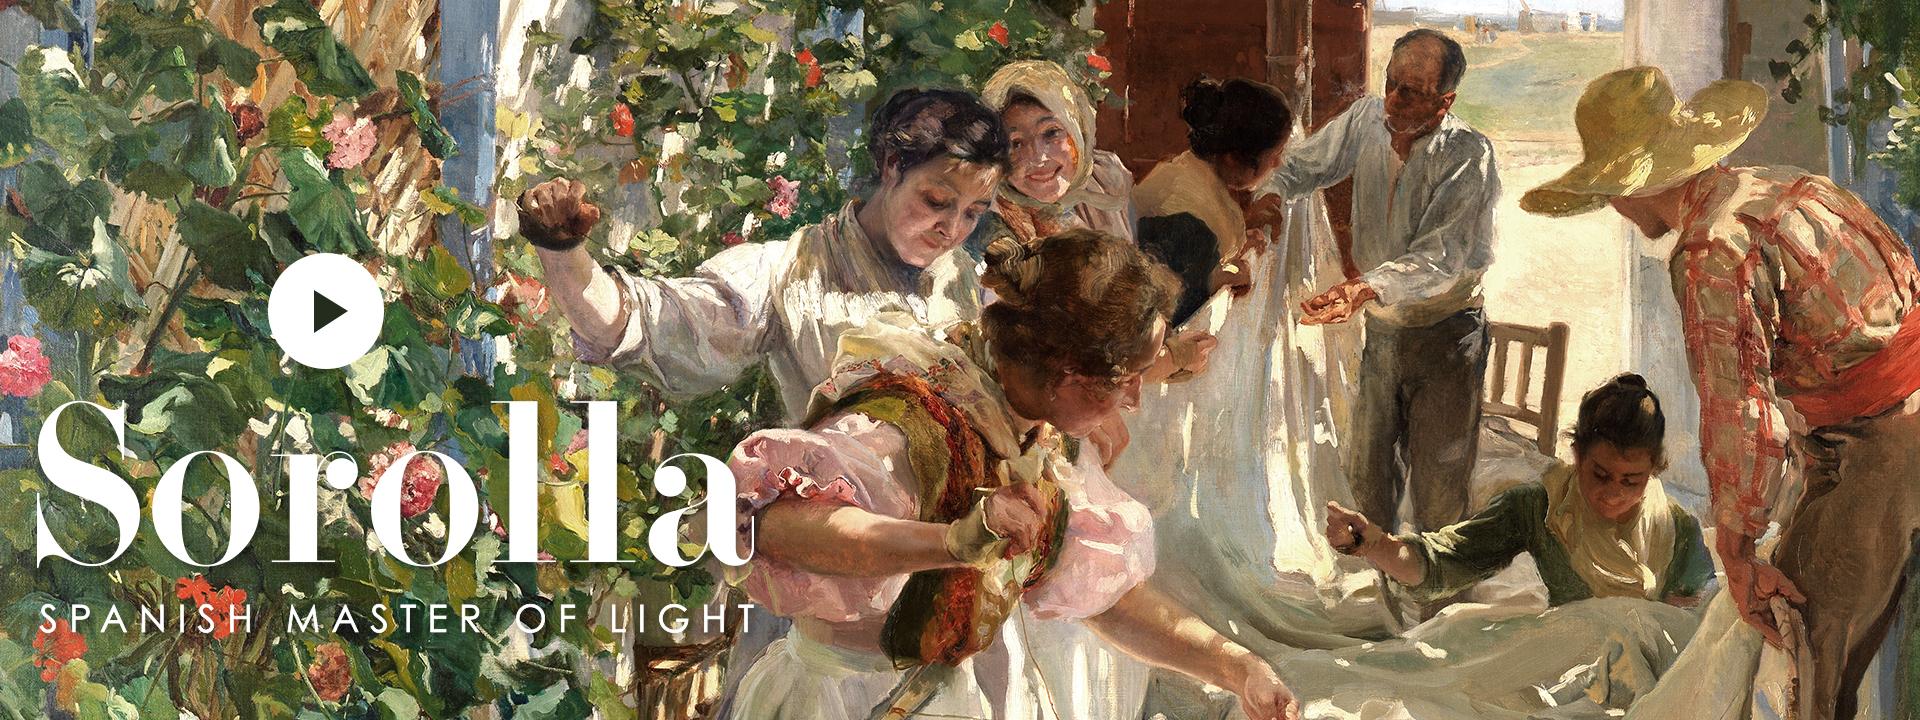 Sorolla: Spanish Master of Light | Archive | National Gallery, London